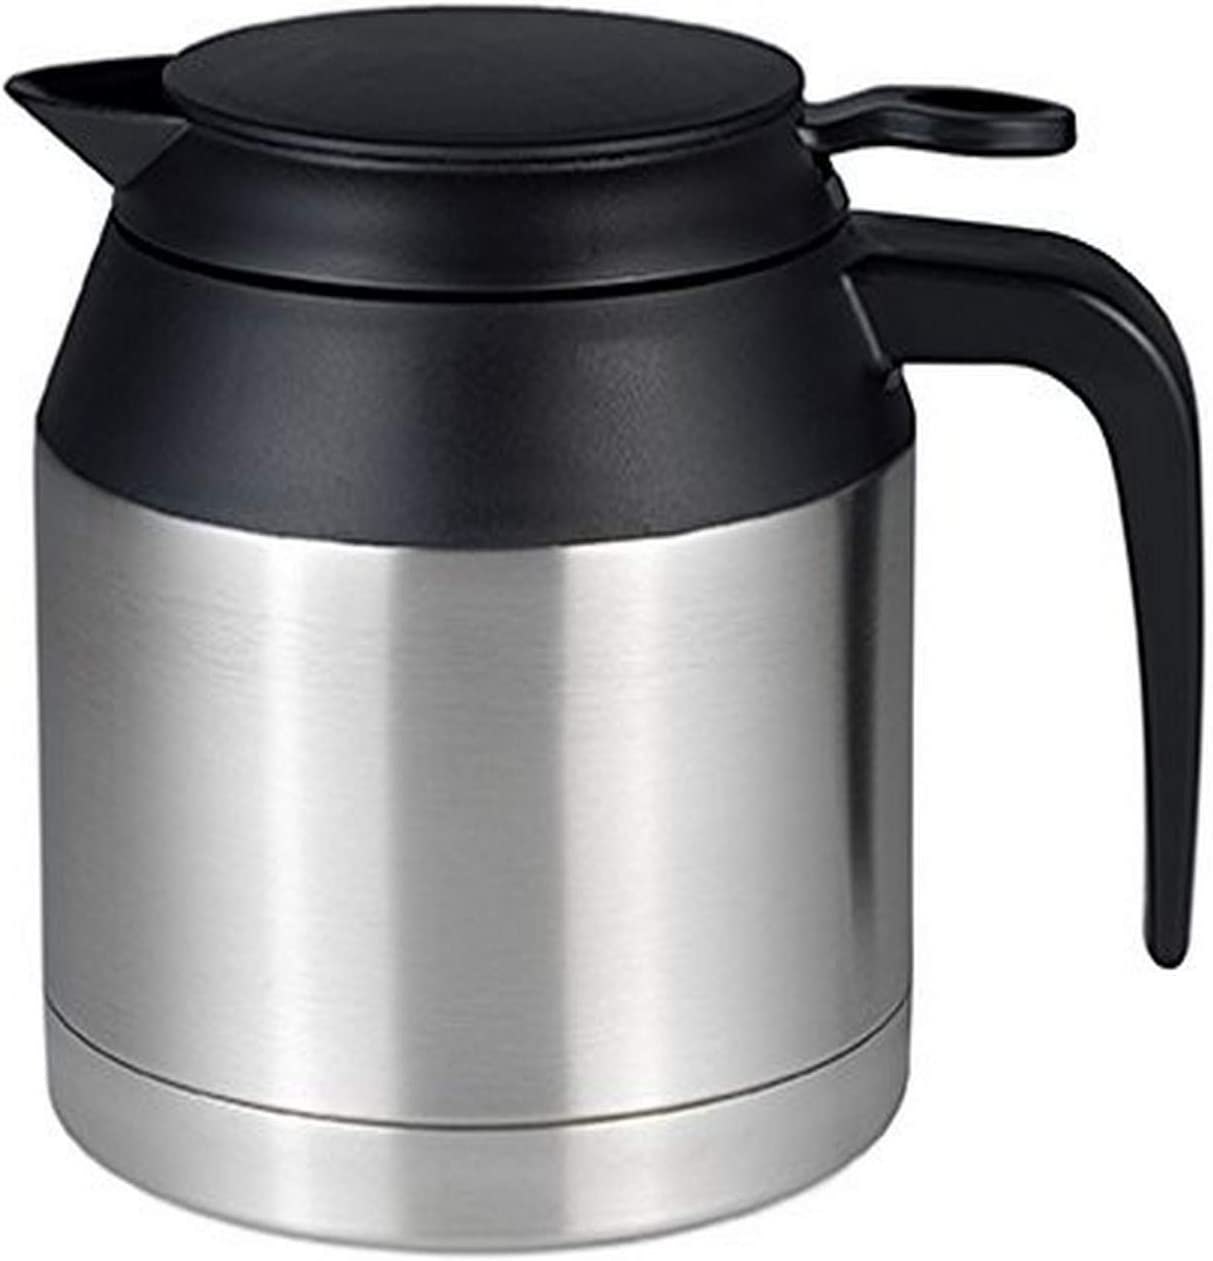 Bonavita BV1500RC01 5-cup Thermal Carafe, Silver/Black 61RBEcY2ThL